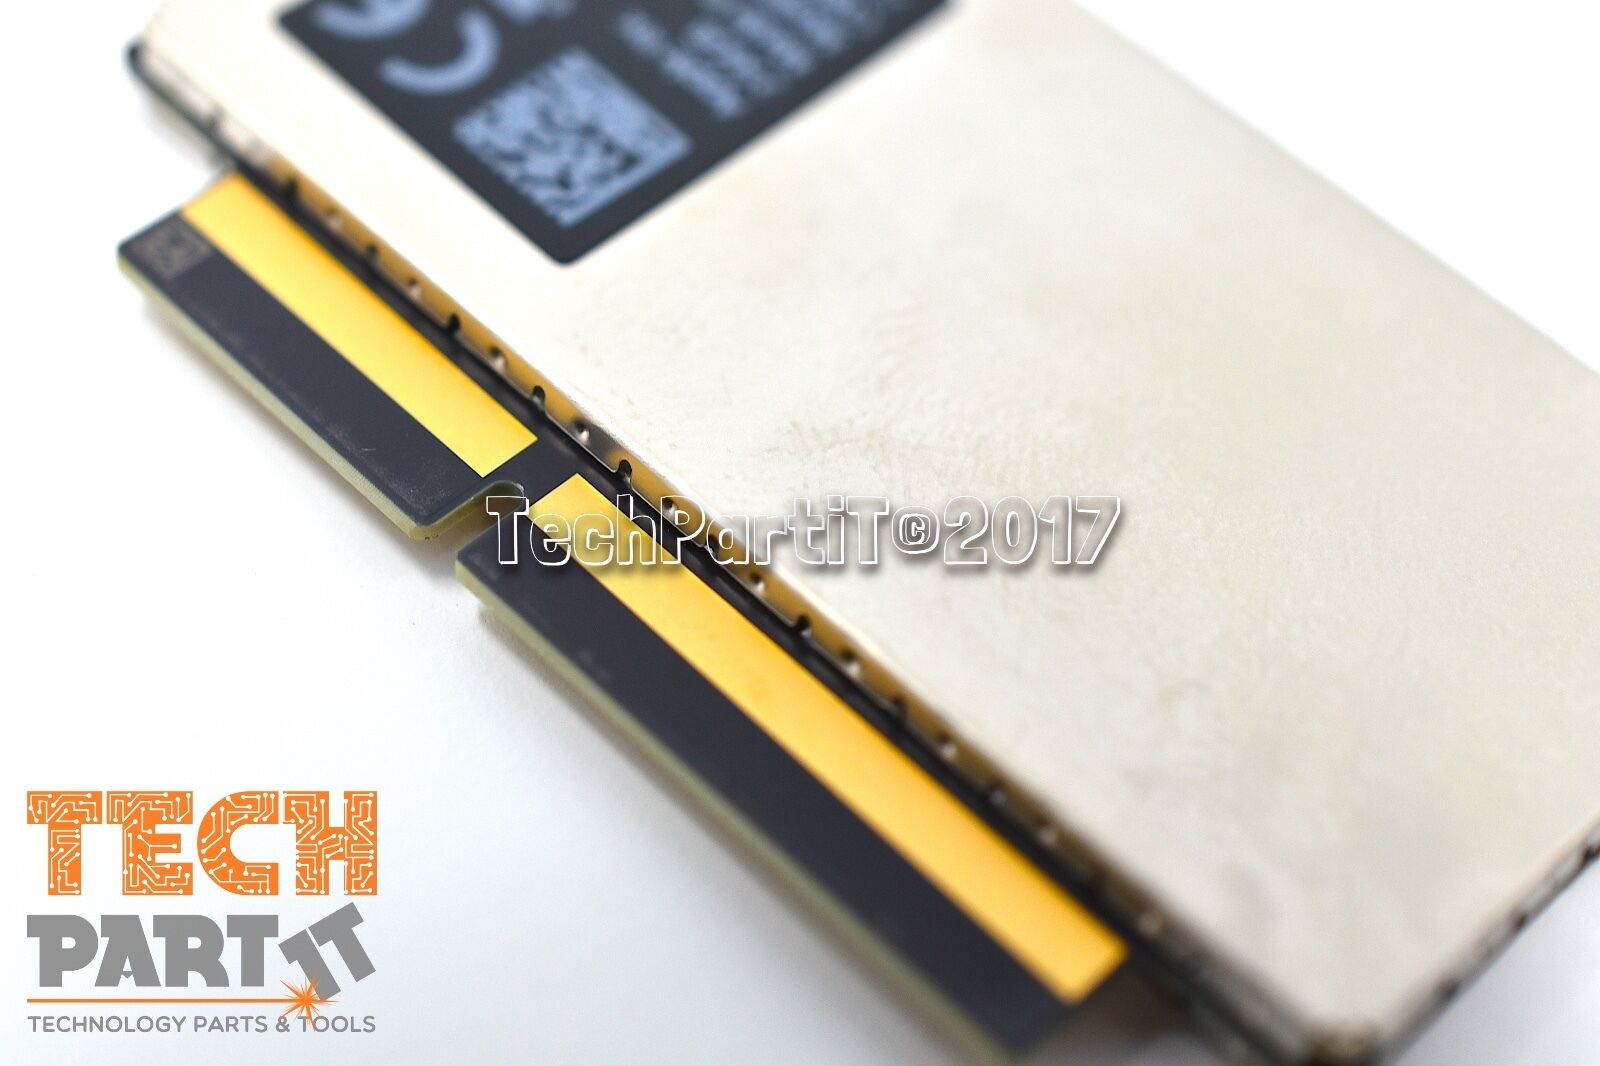 "128Gb SSD PCIe-based flash Drive Storage - 13"" MacBook Pro ..."